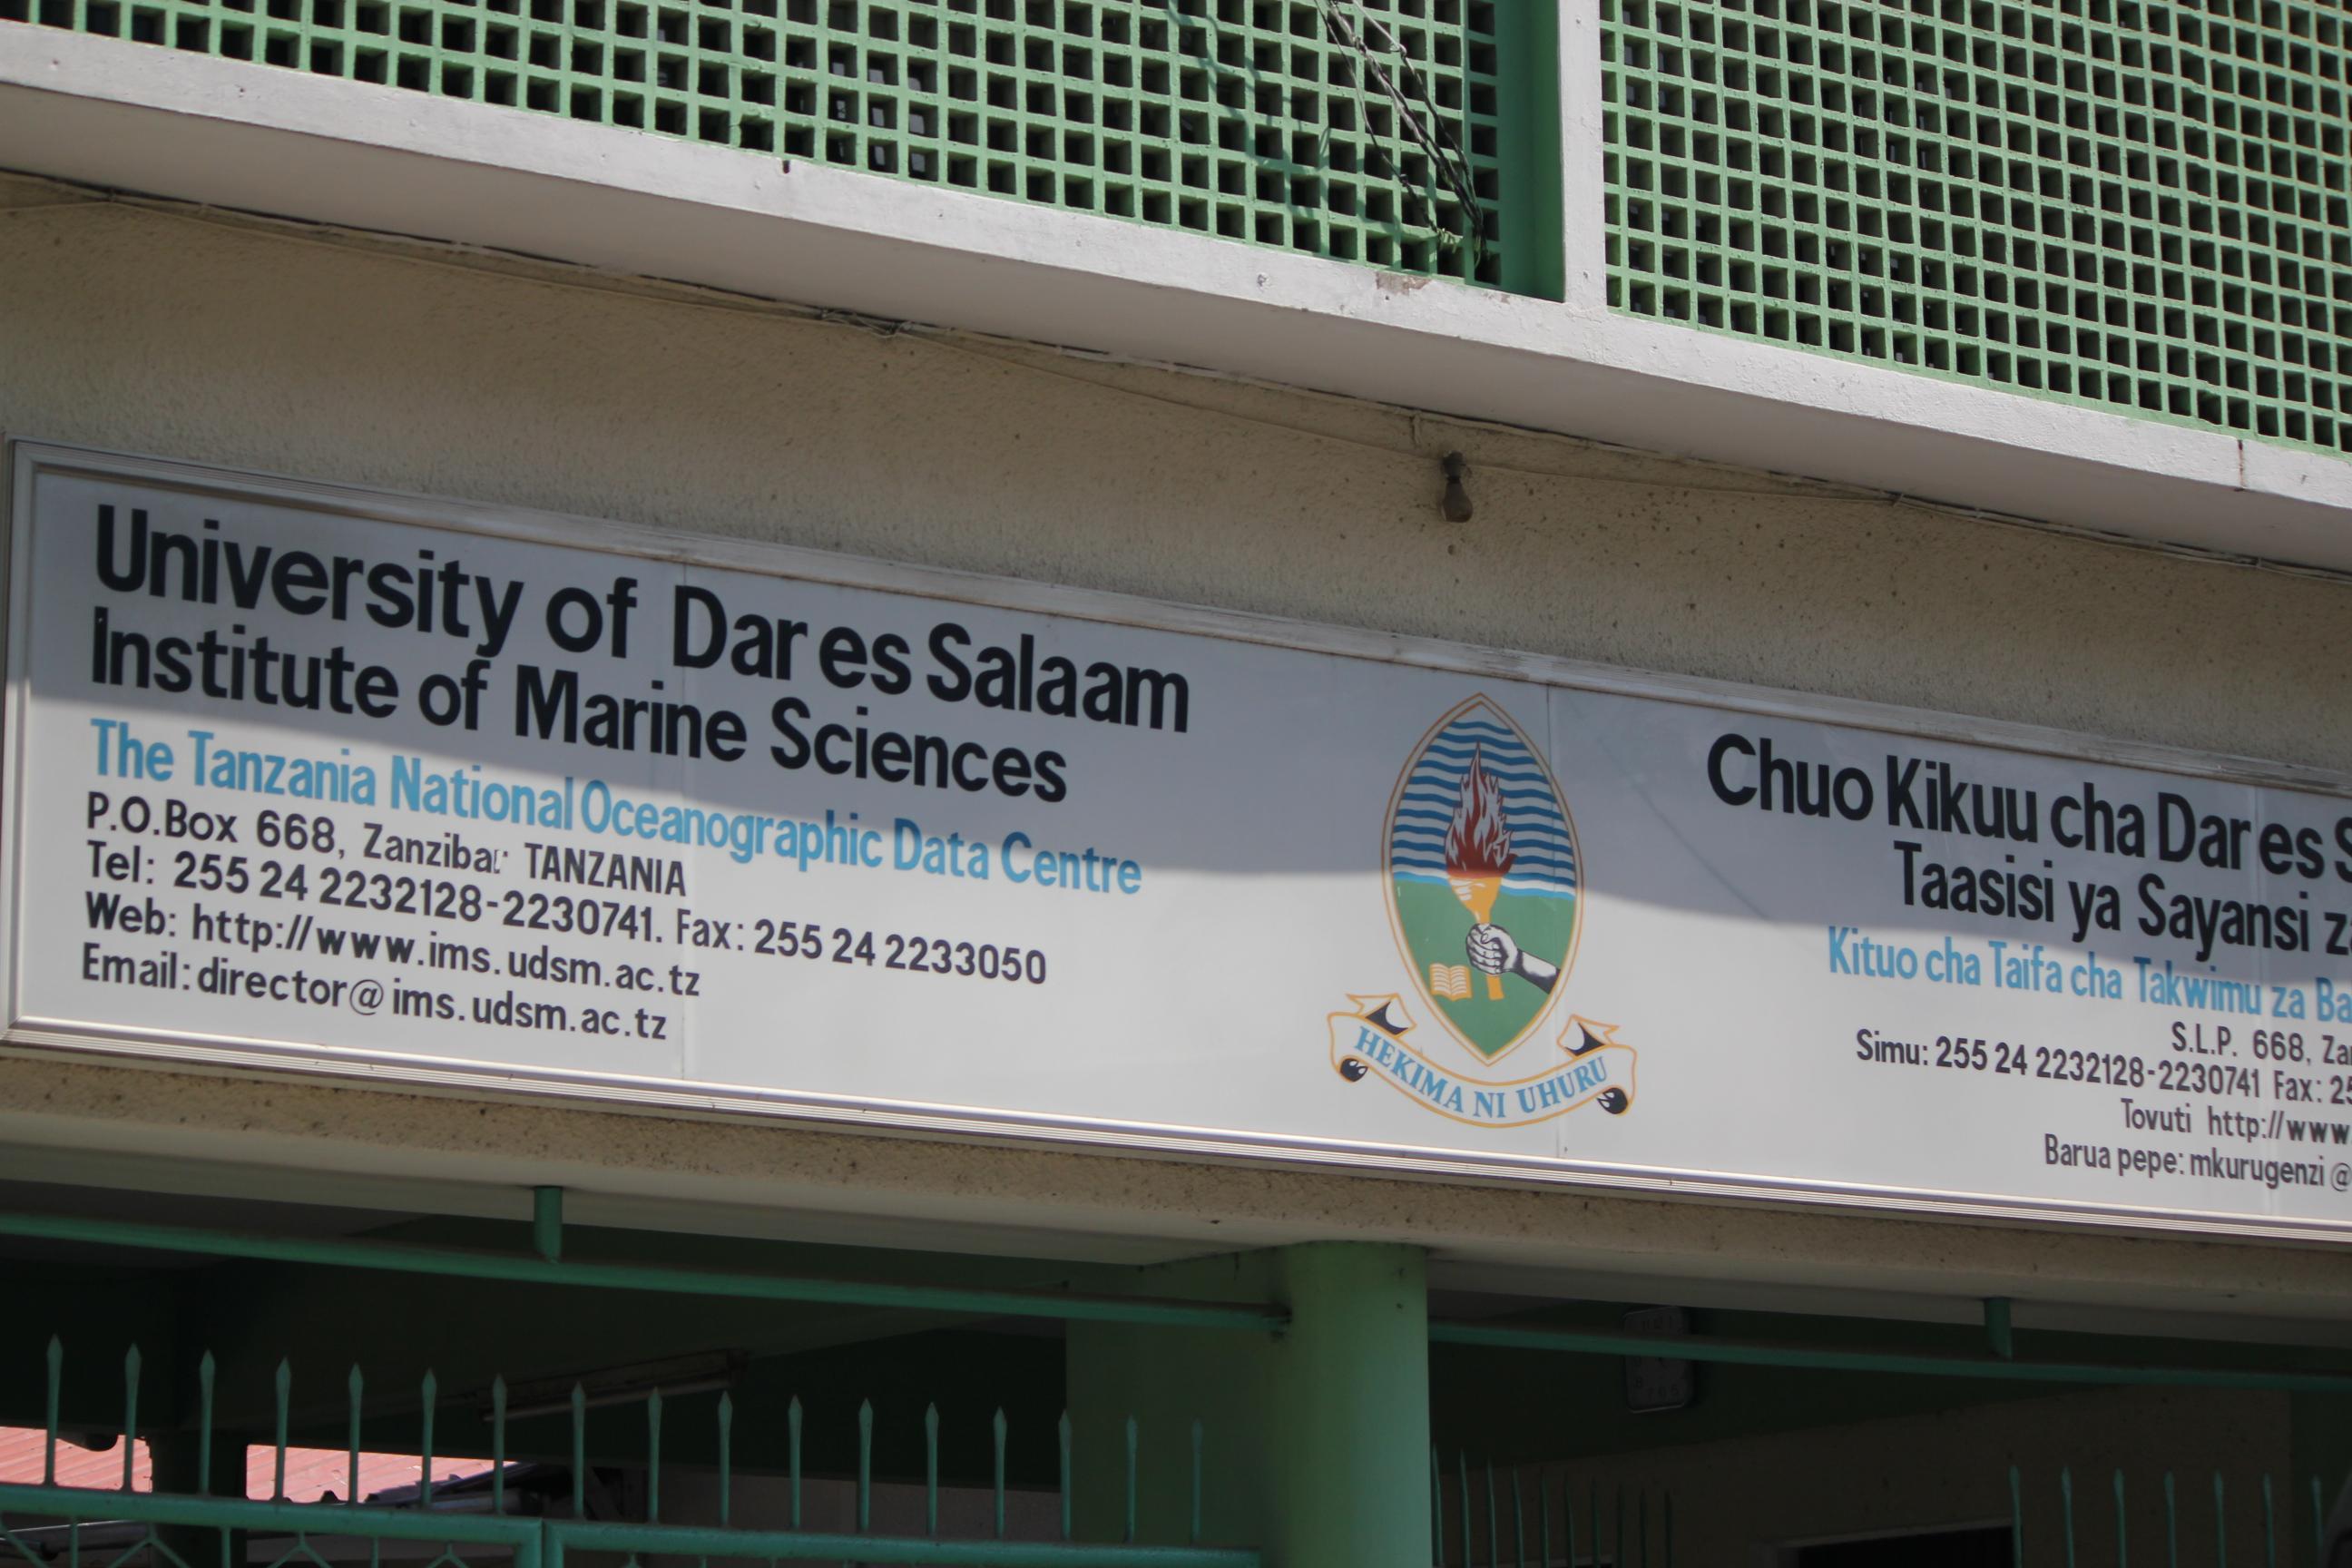 University of Dar es Salaam  - Marine Sciences; Stone Town, Zanzibar, Tanzania; 2011